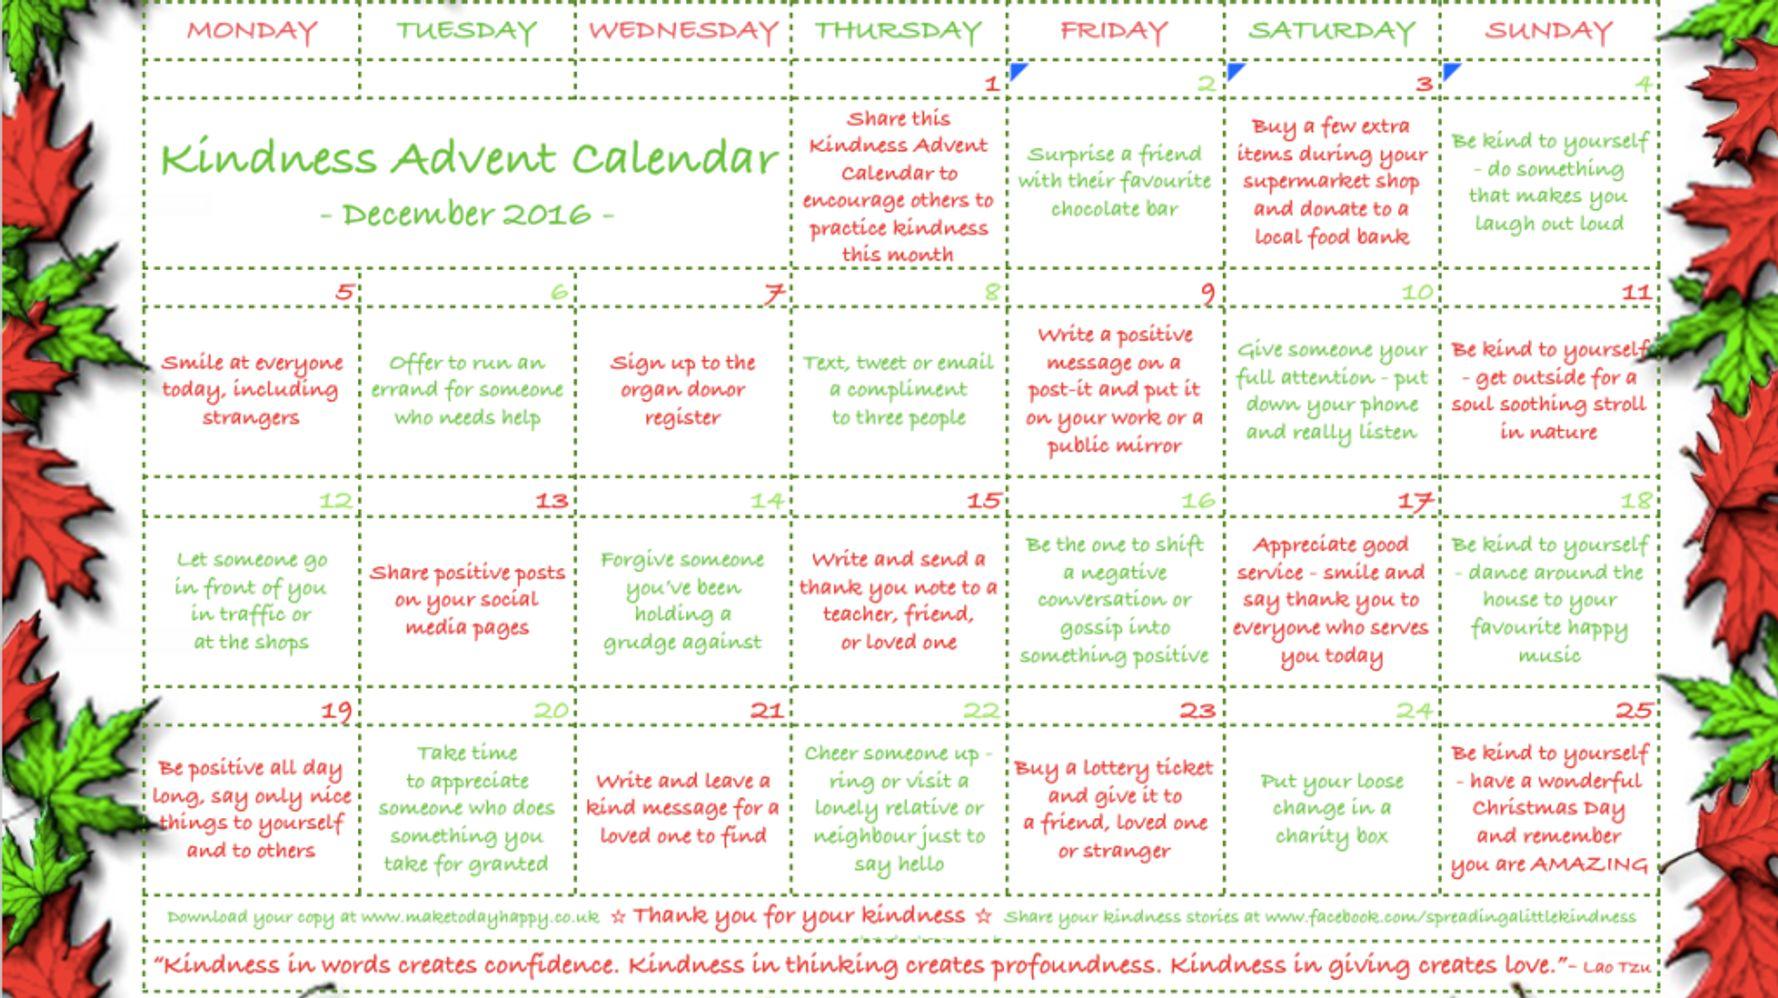 The Kindness Advent Calendar | HuffPost